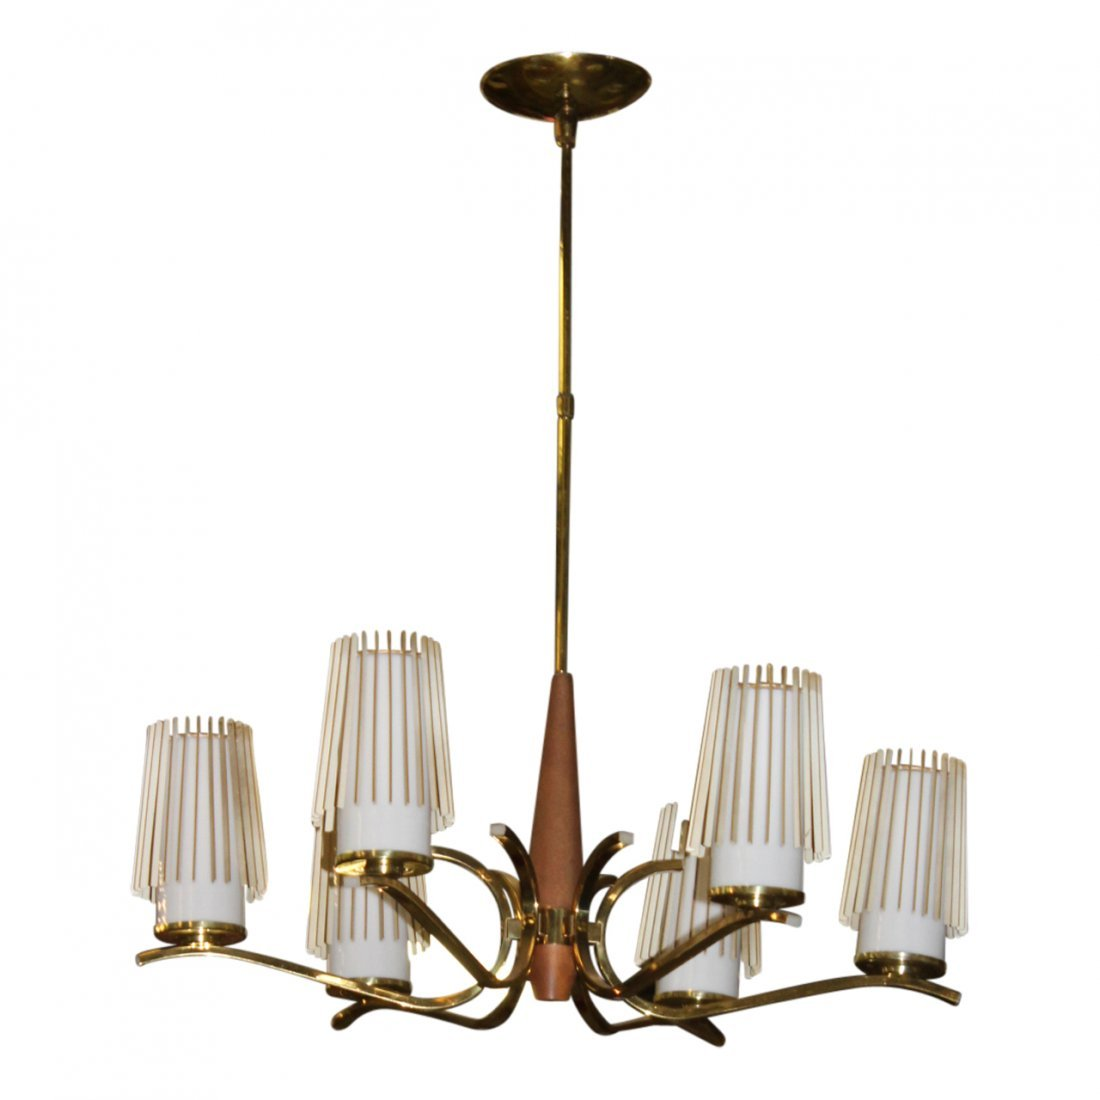 MCM Modern Atomic Style Glass Wood Brass Chandelier